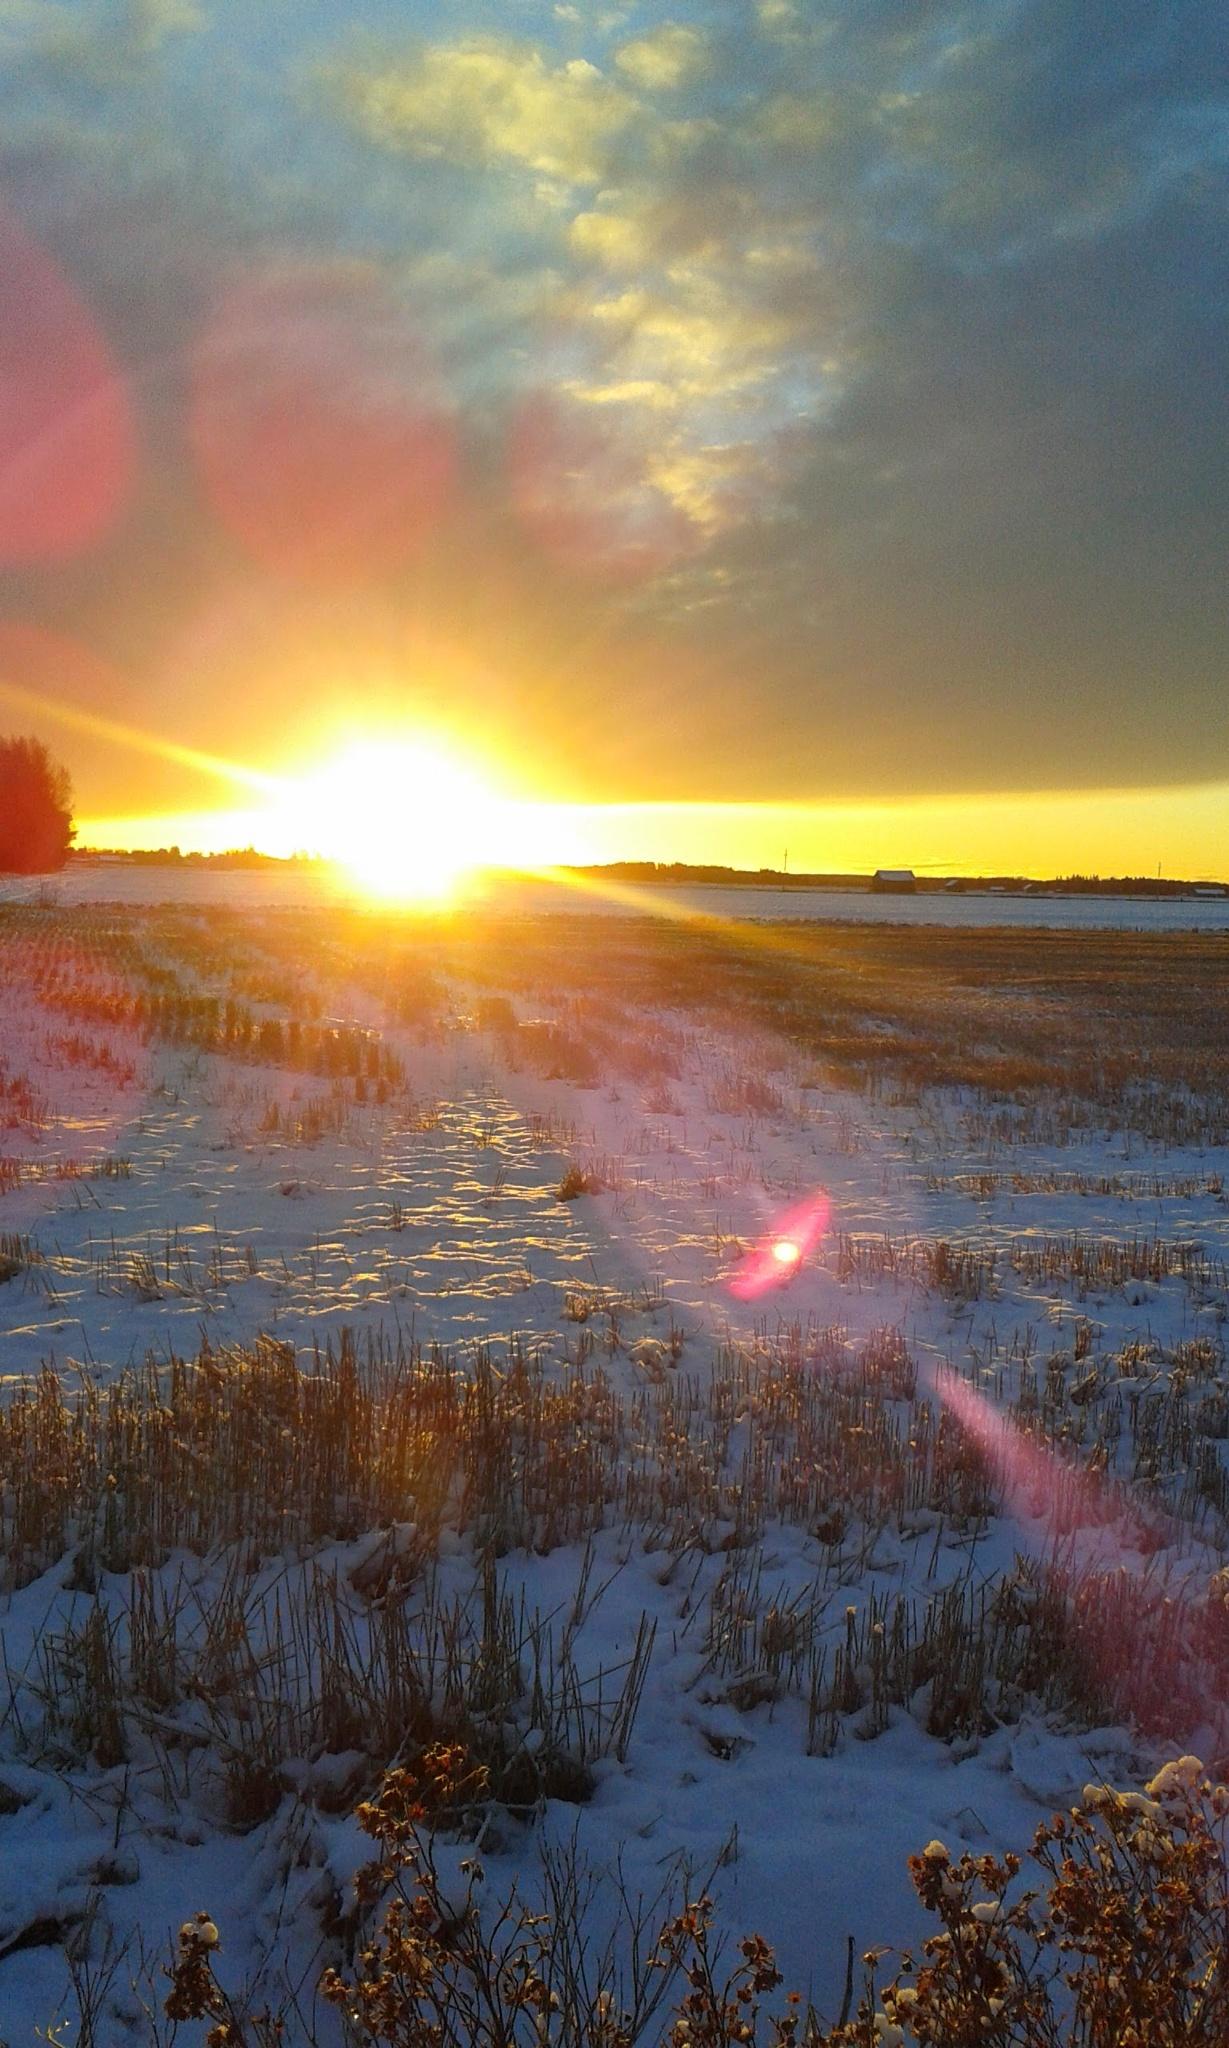 Auringon nousu by Pirkko Liisa Nikko